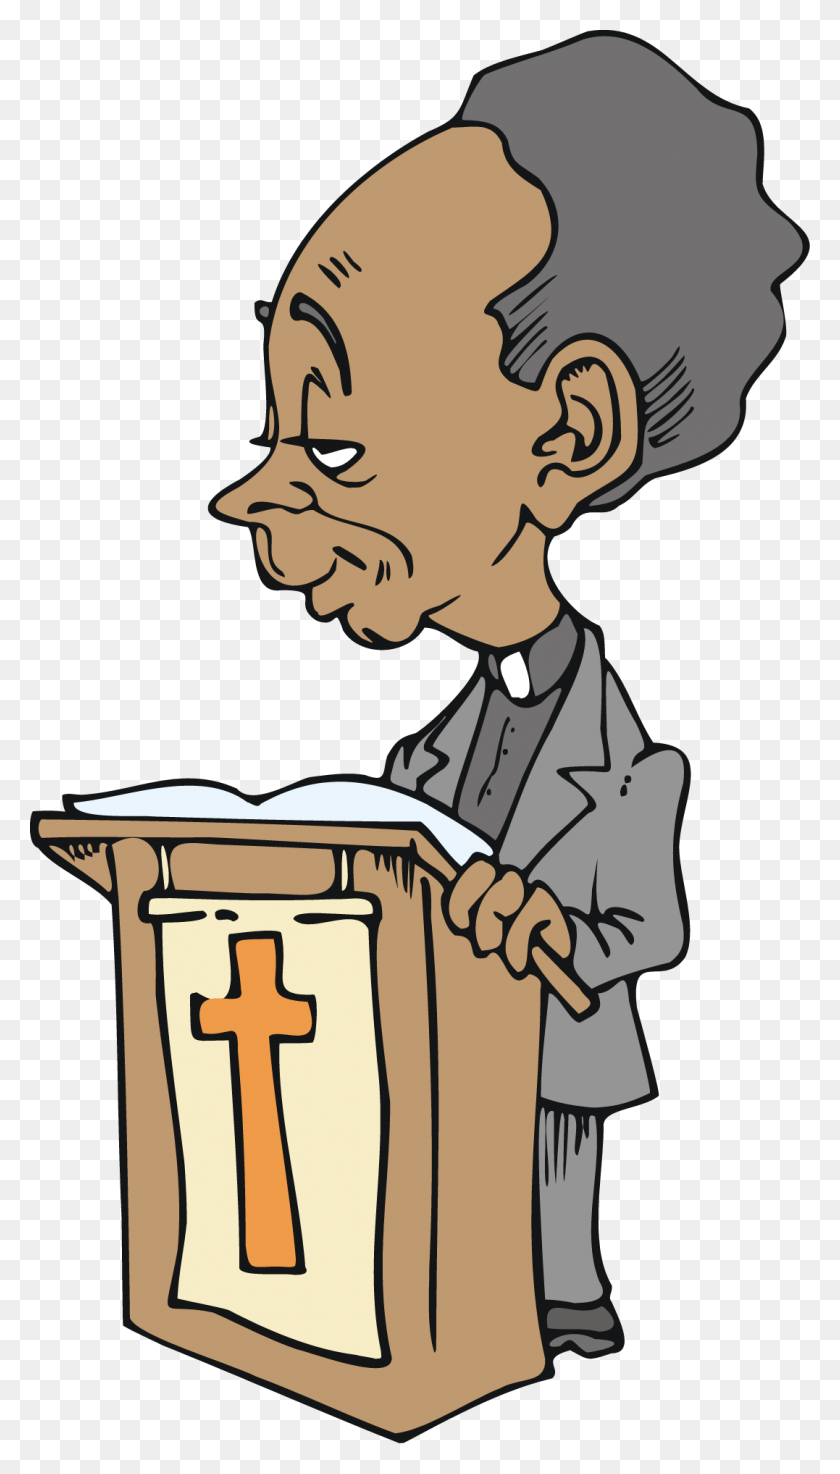 African American Preacher Clip Art - Preacher Clipart